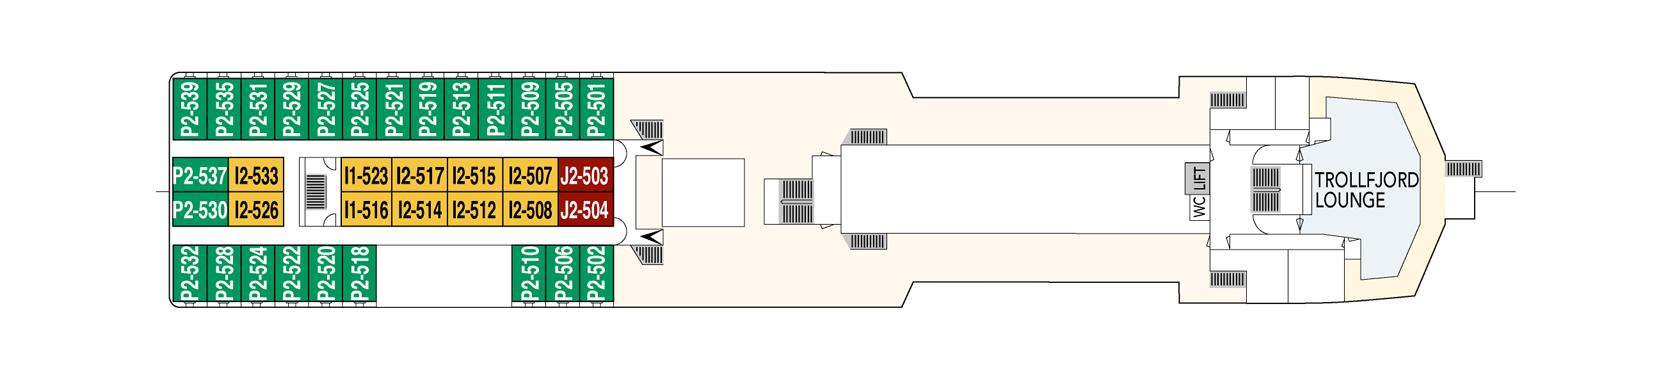 Vesteralen Deck E